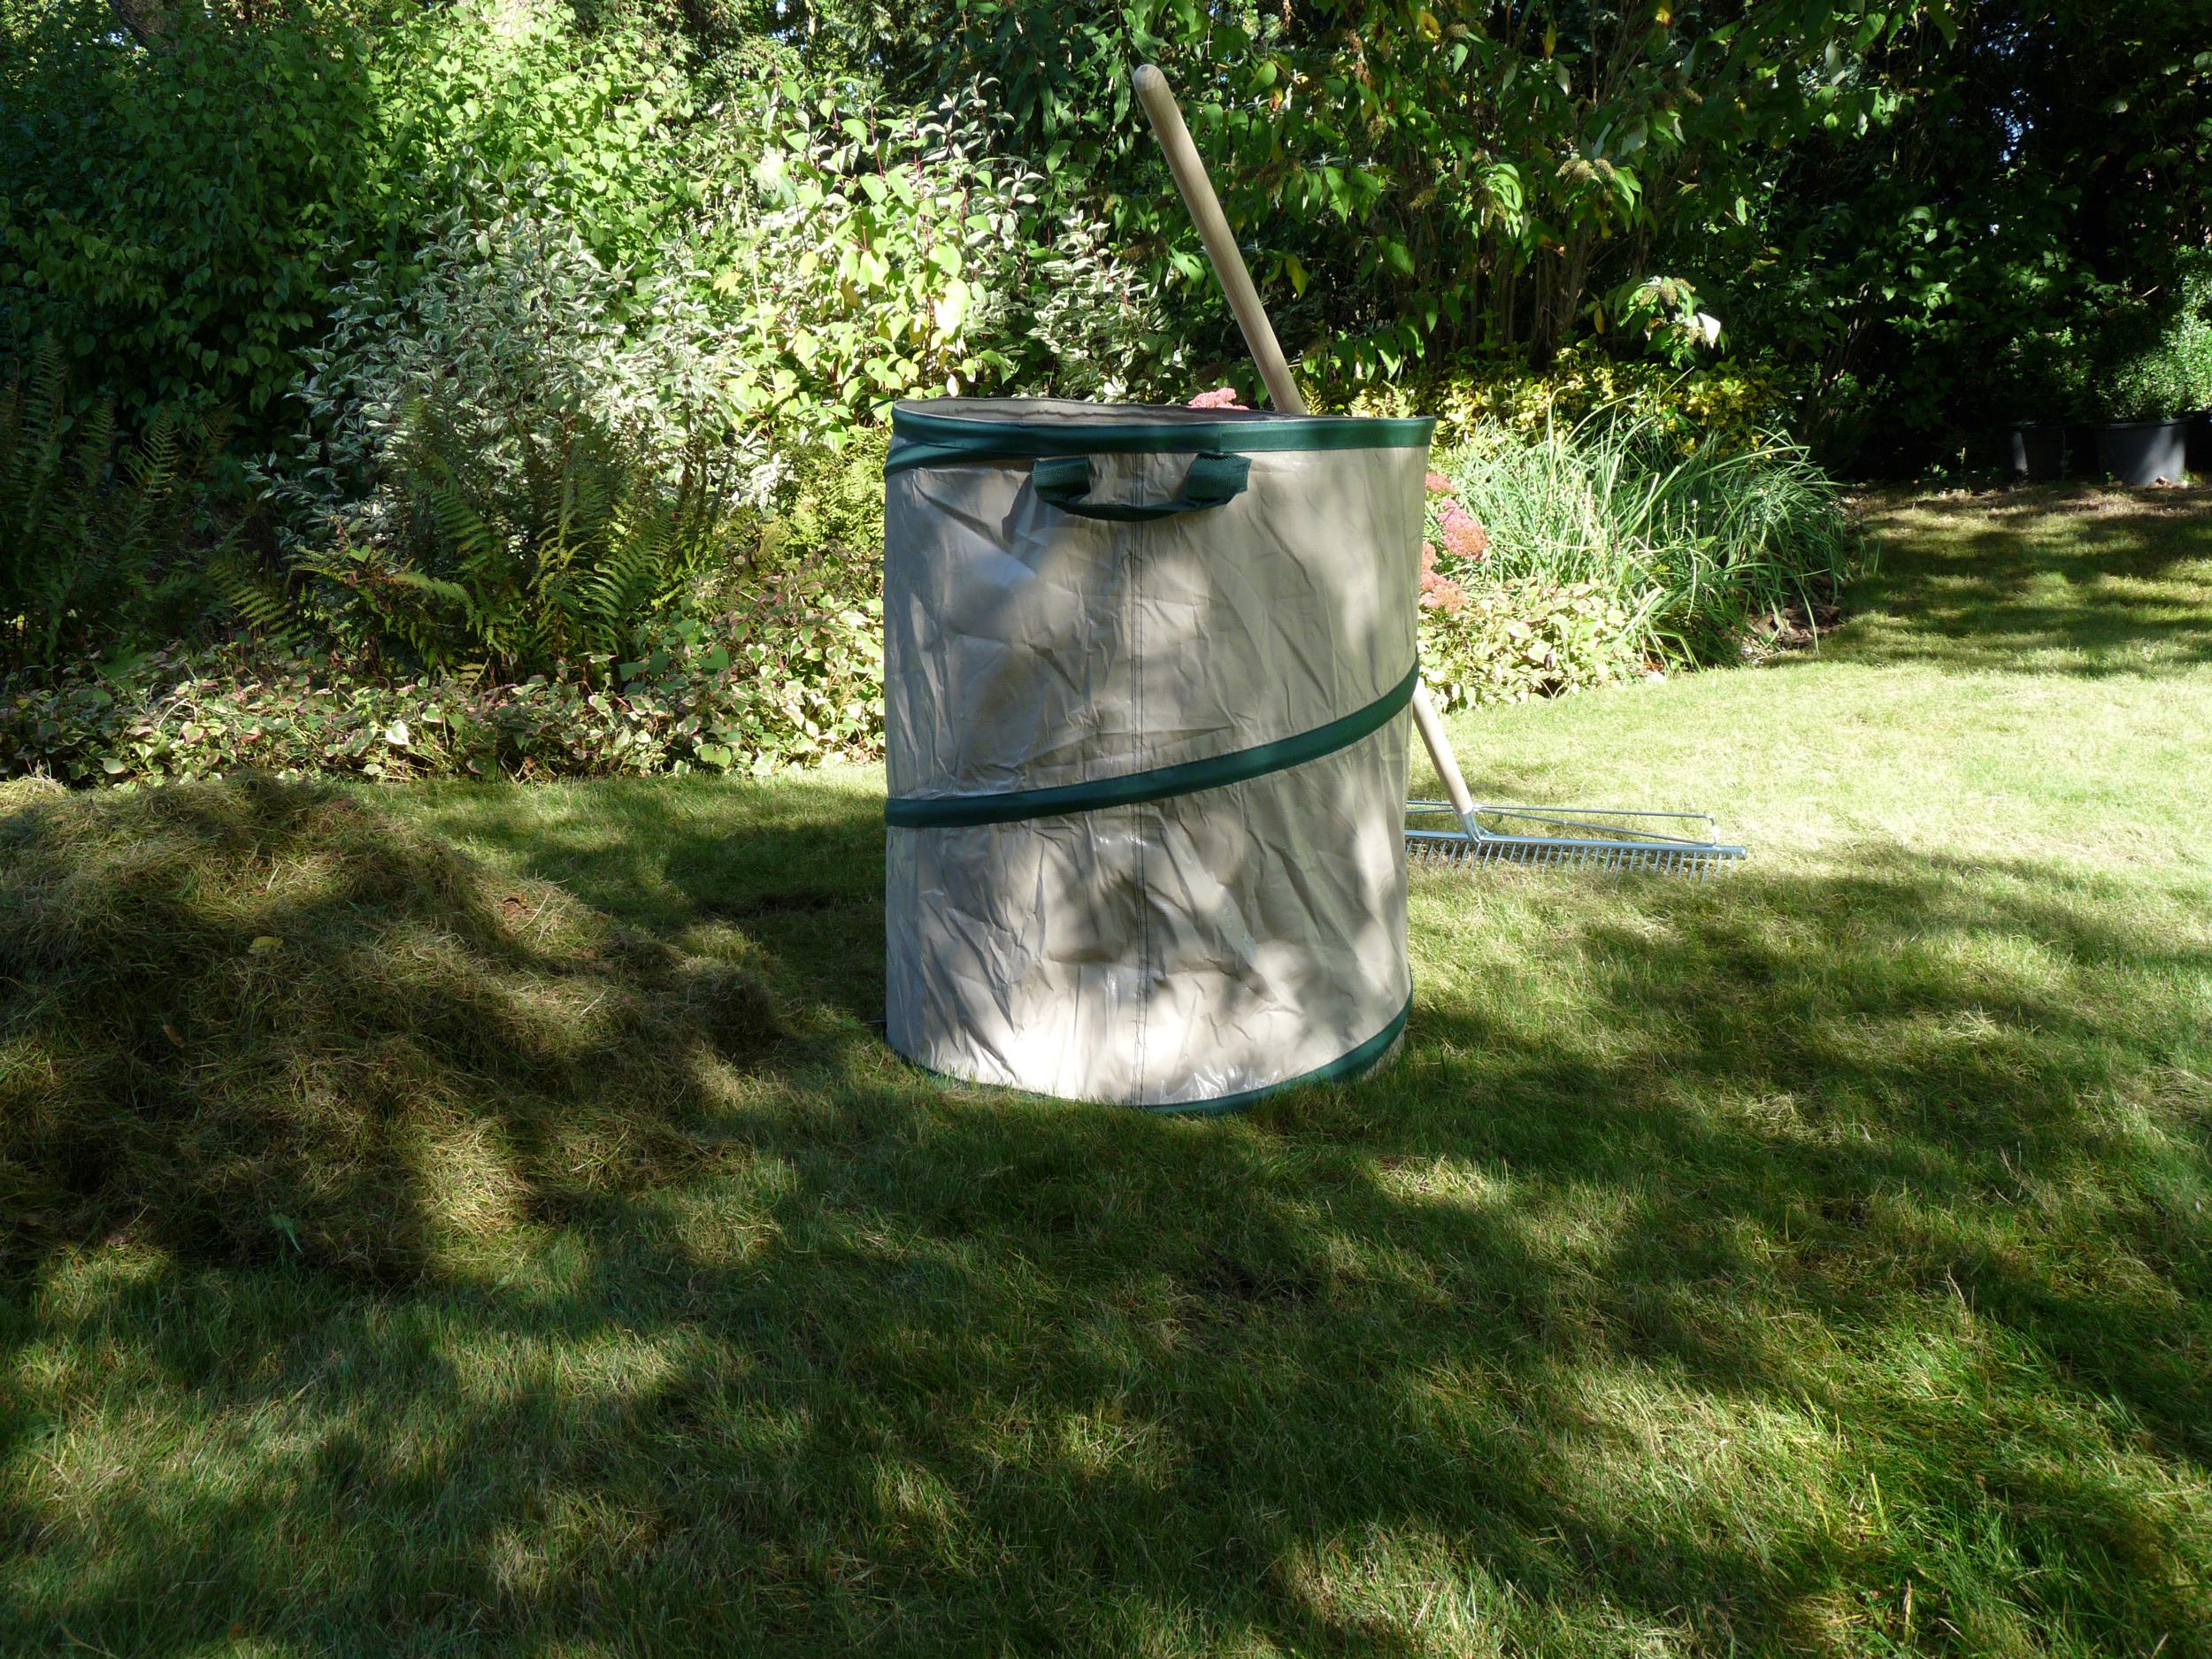 Sac de jardin repliable 165 litres